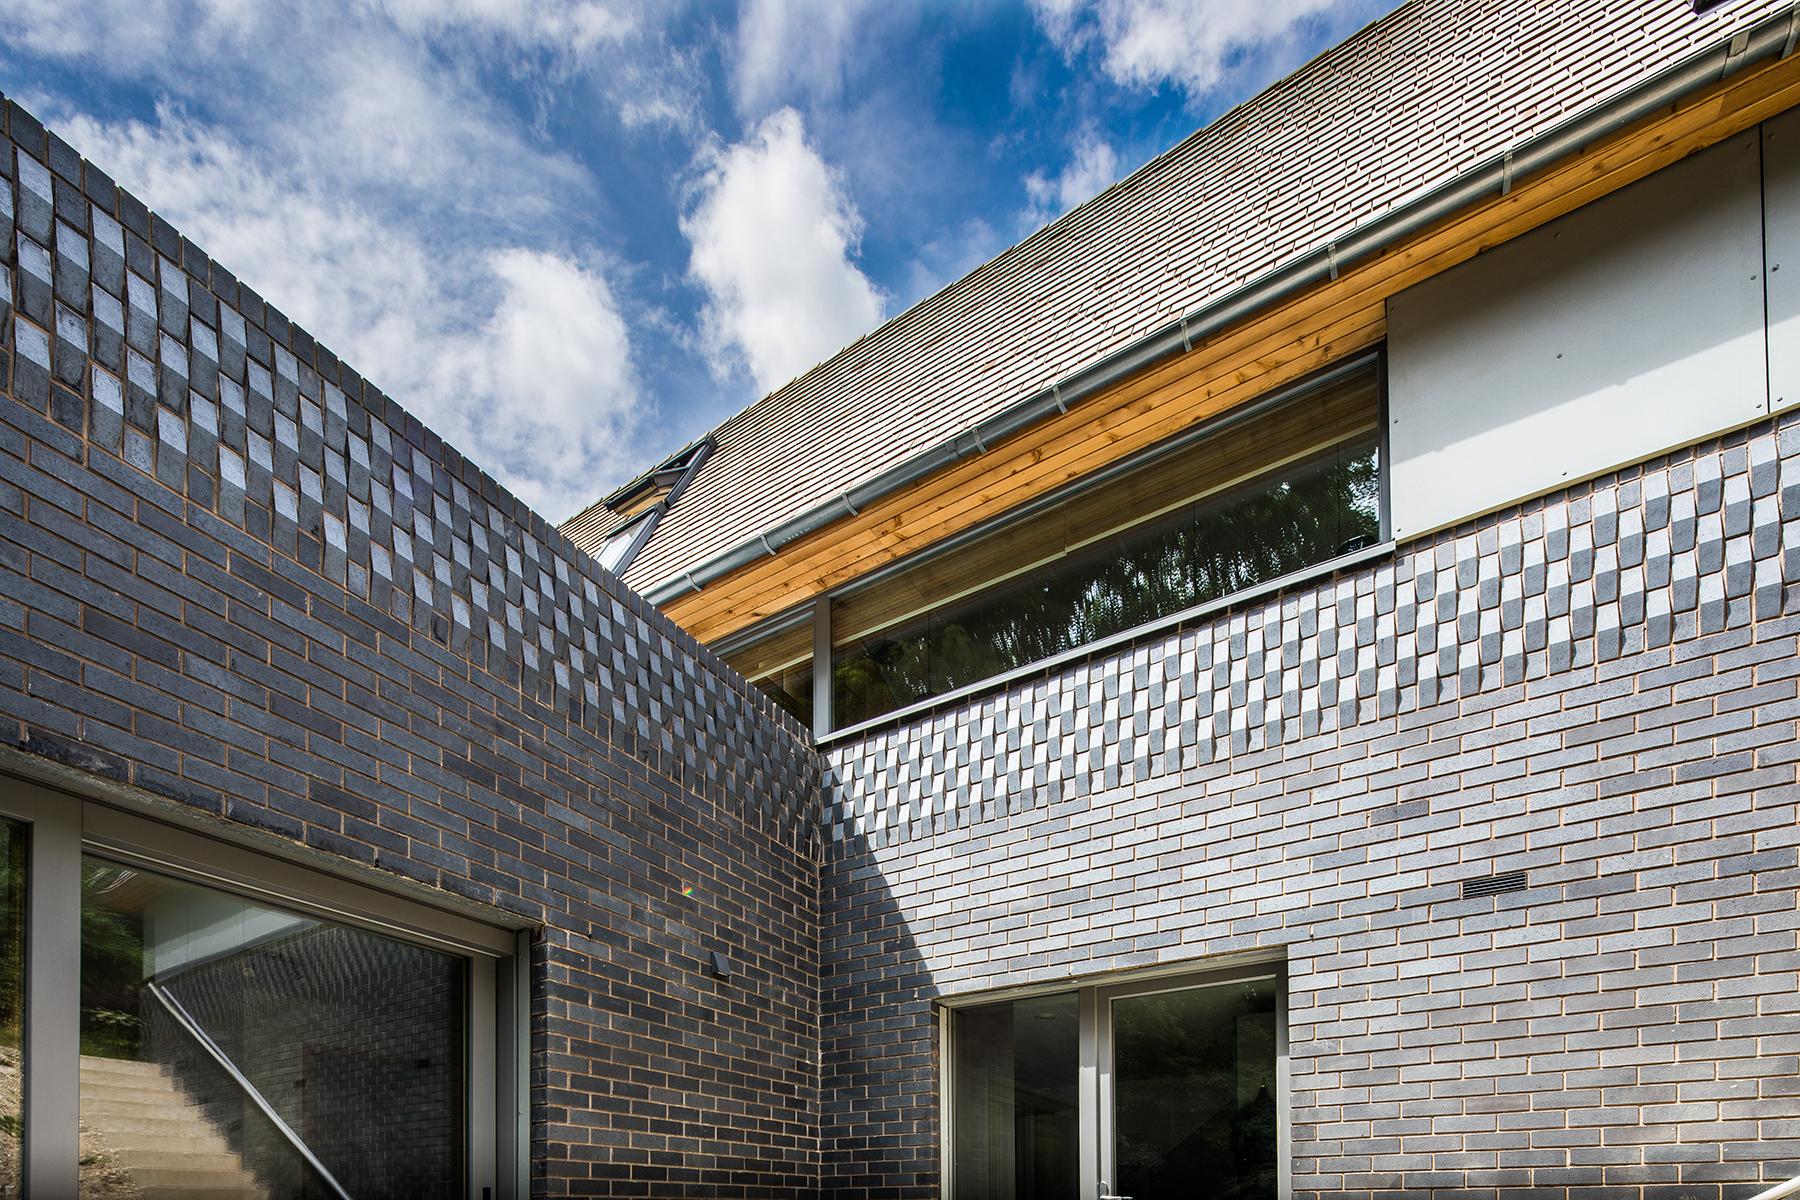 sheffield, architecture, interior photography, architectural photography, self build, new build, contemporary architecture